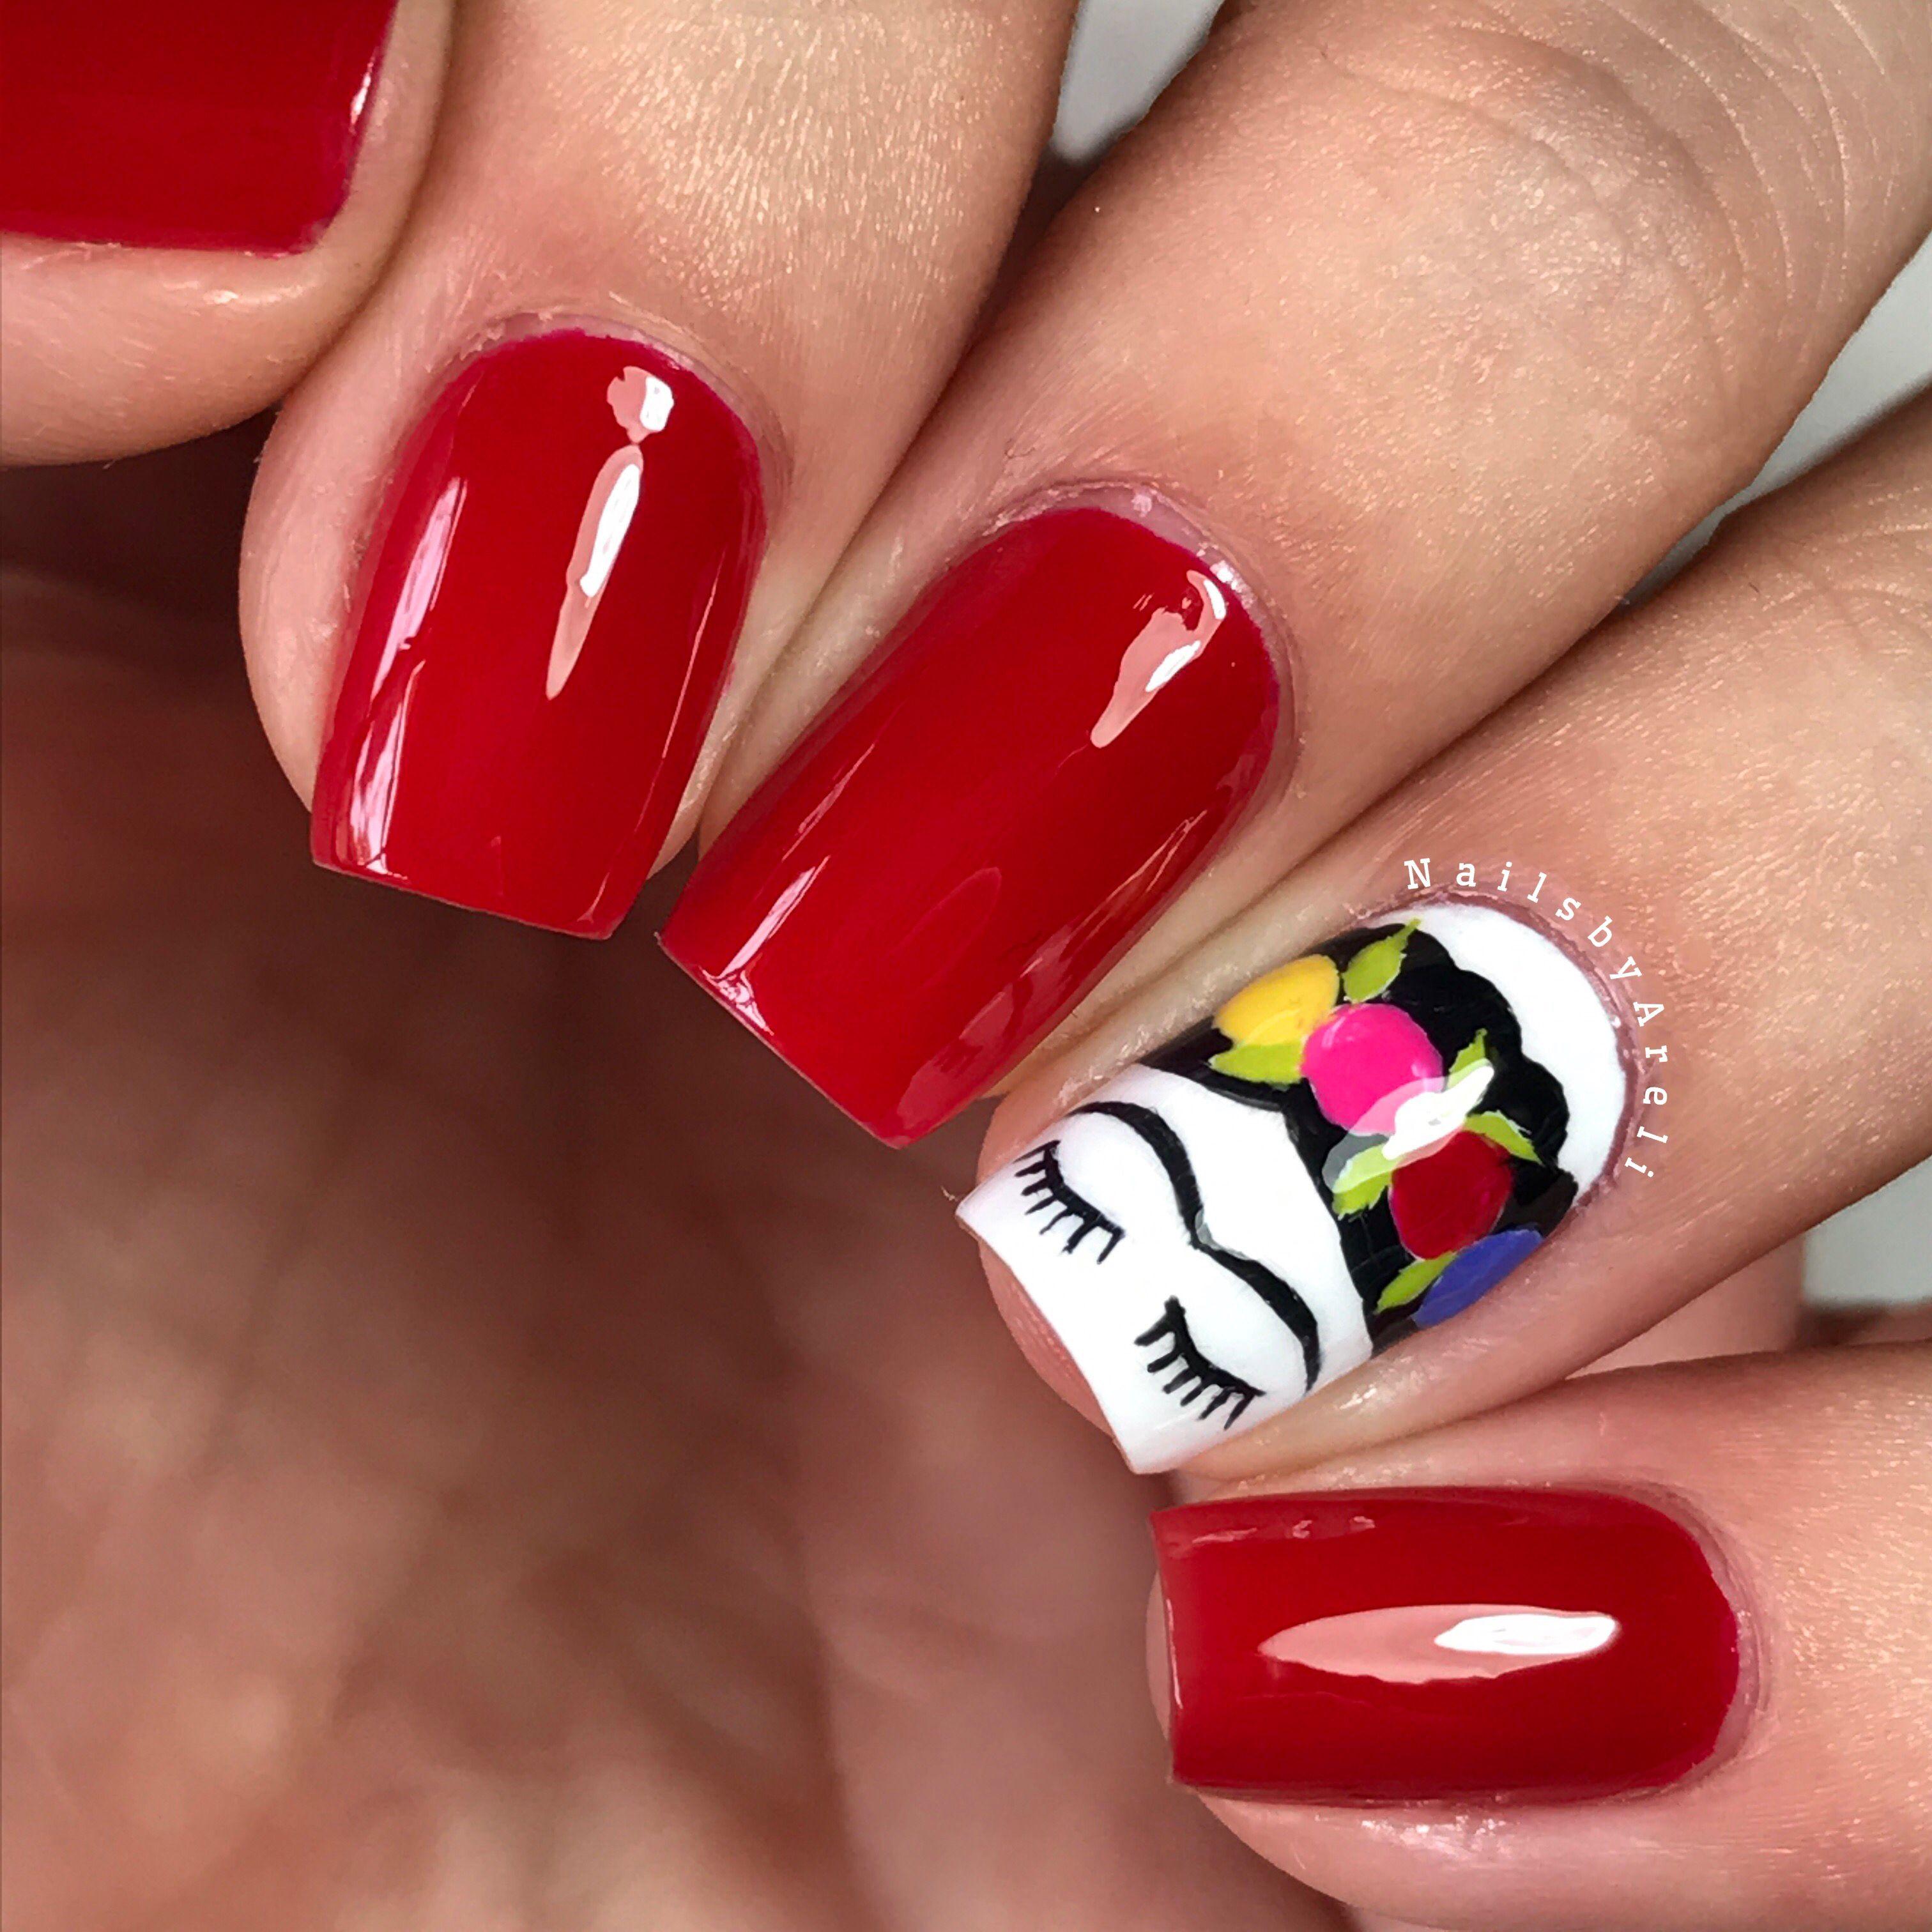 Frida Kahlo Nails❤ 🌵 #NailArt #NailsbyAreli #FridaKahloNails ...